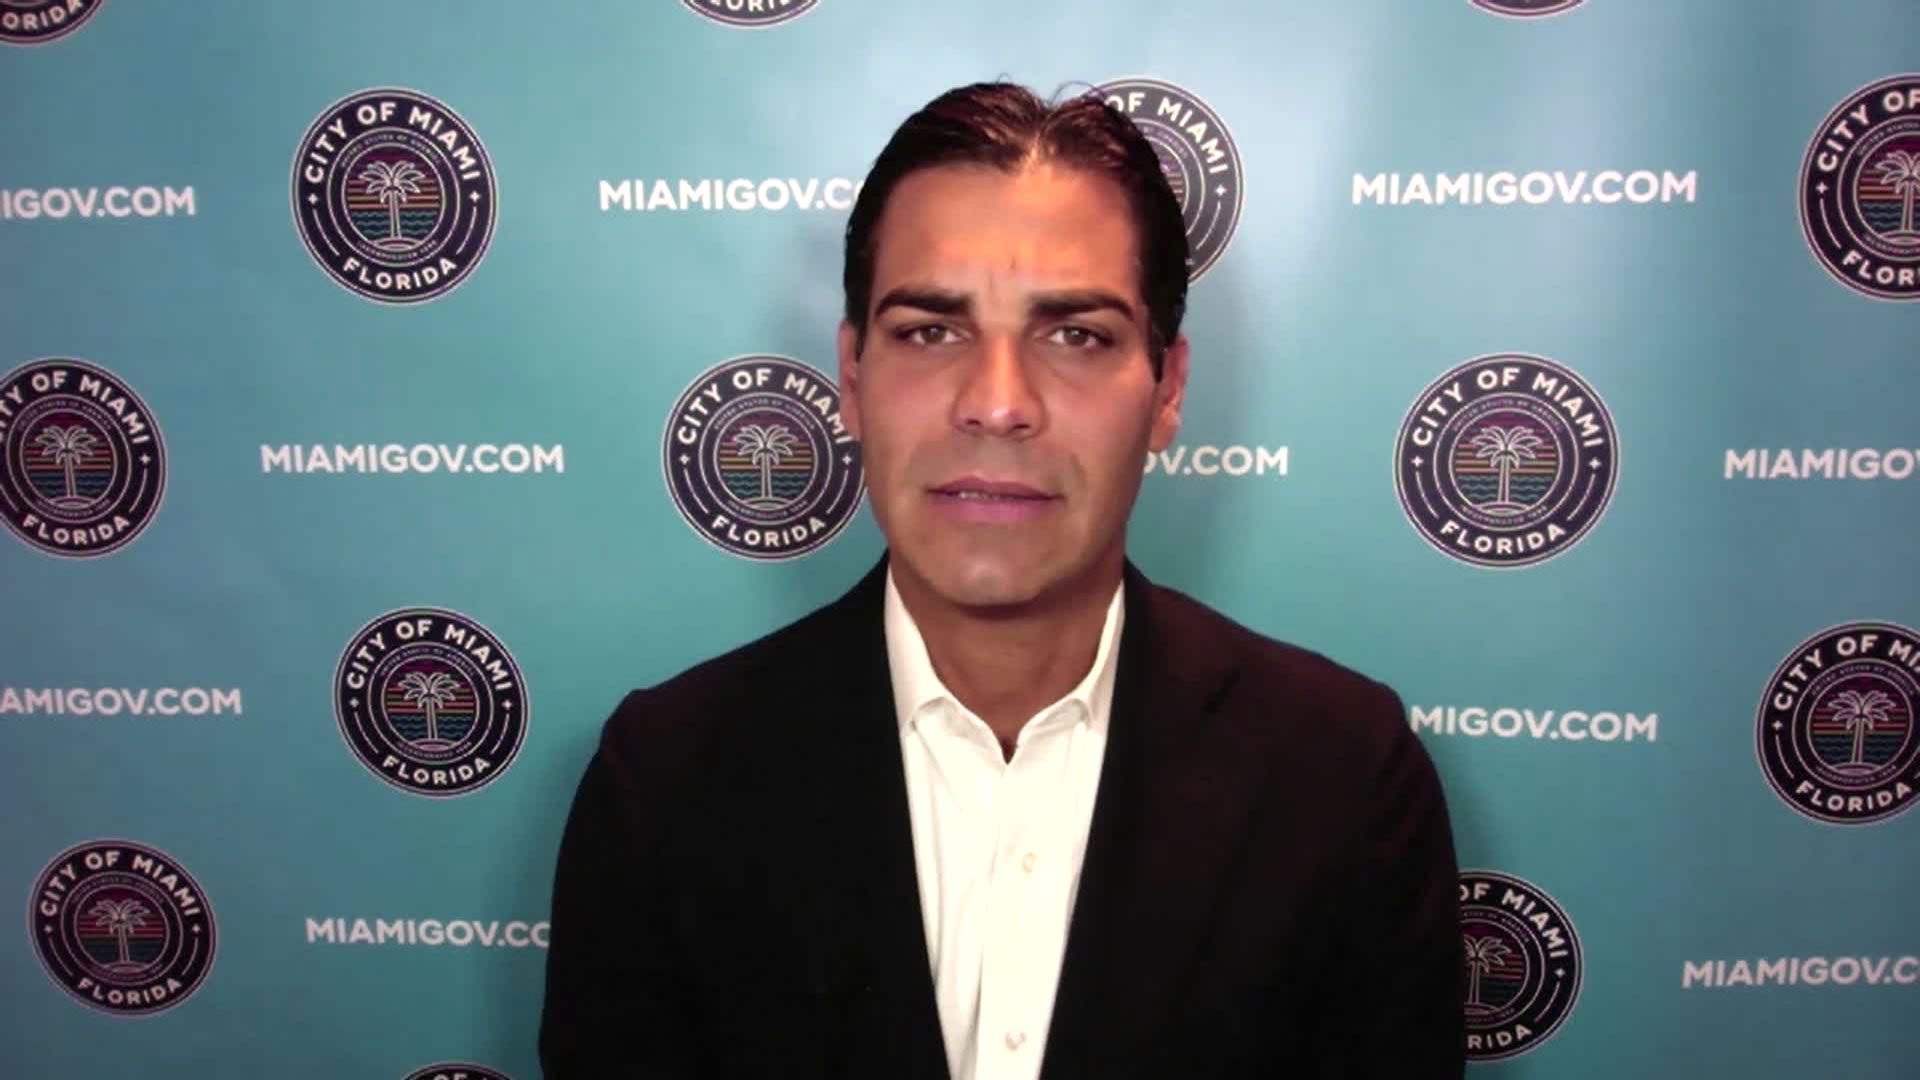 Miami Mayor Francis Suarez speaks with CNN on Monday, September 7.